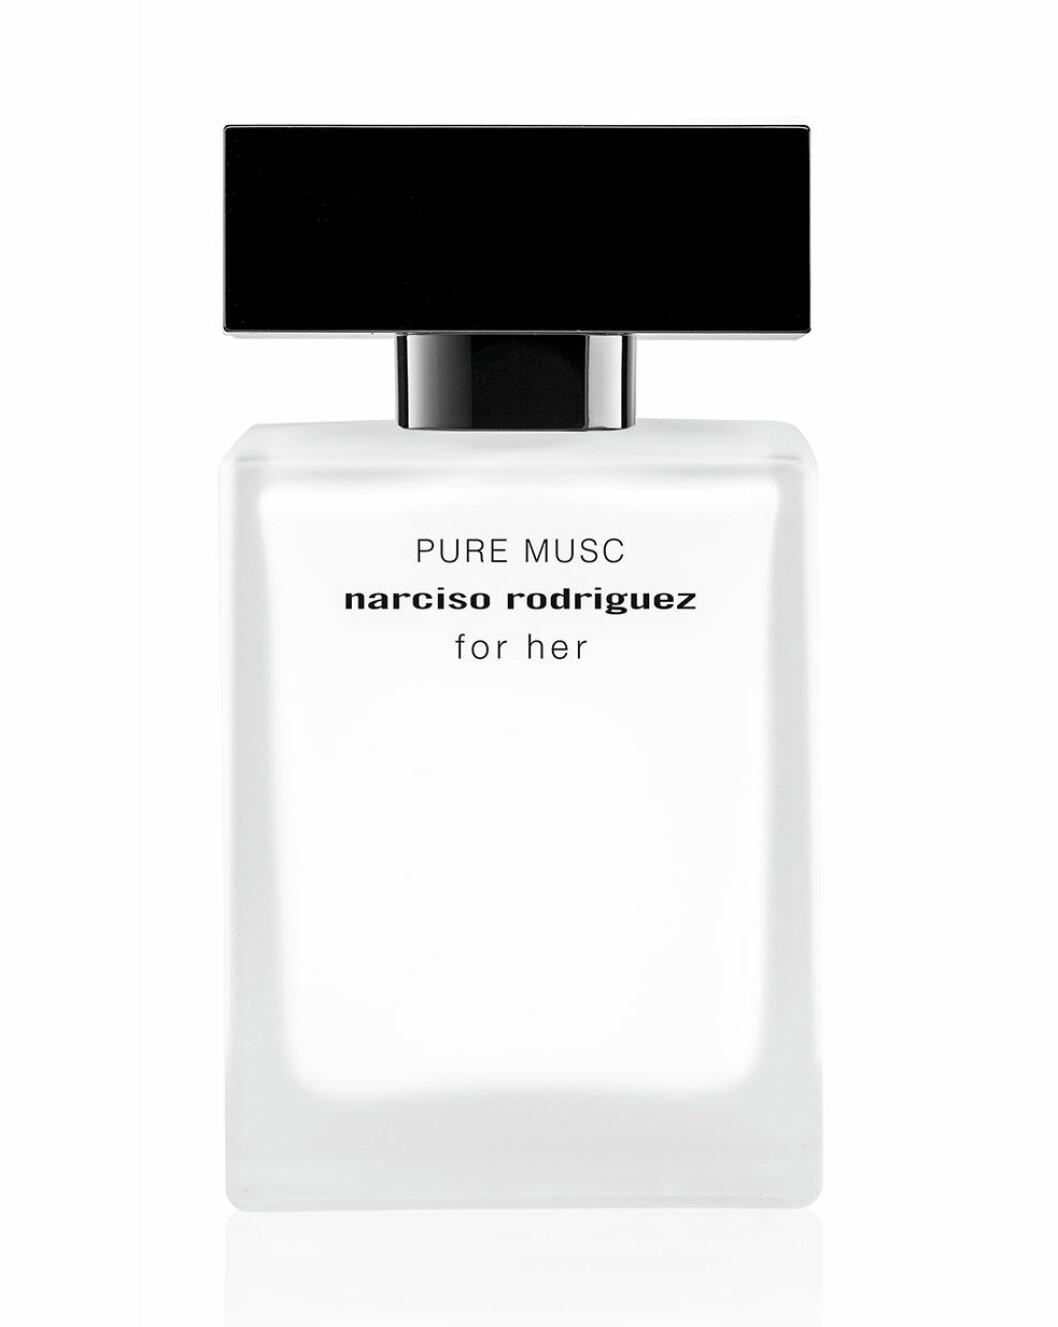 Narciso parfym.